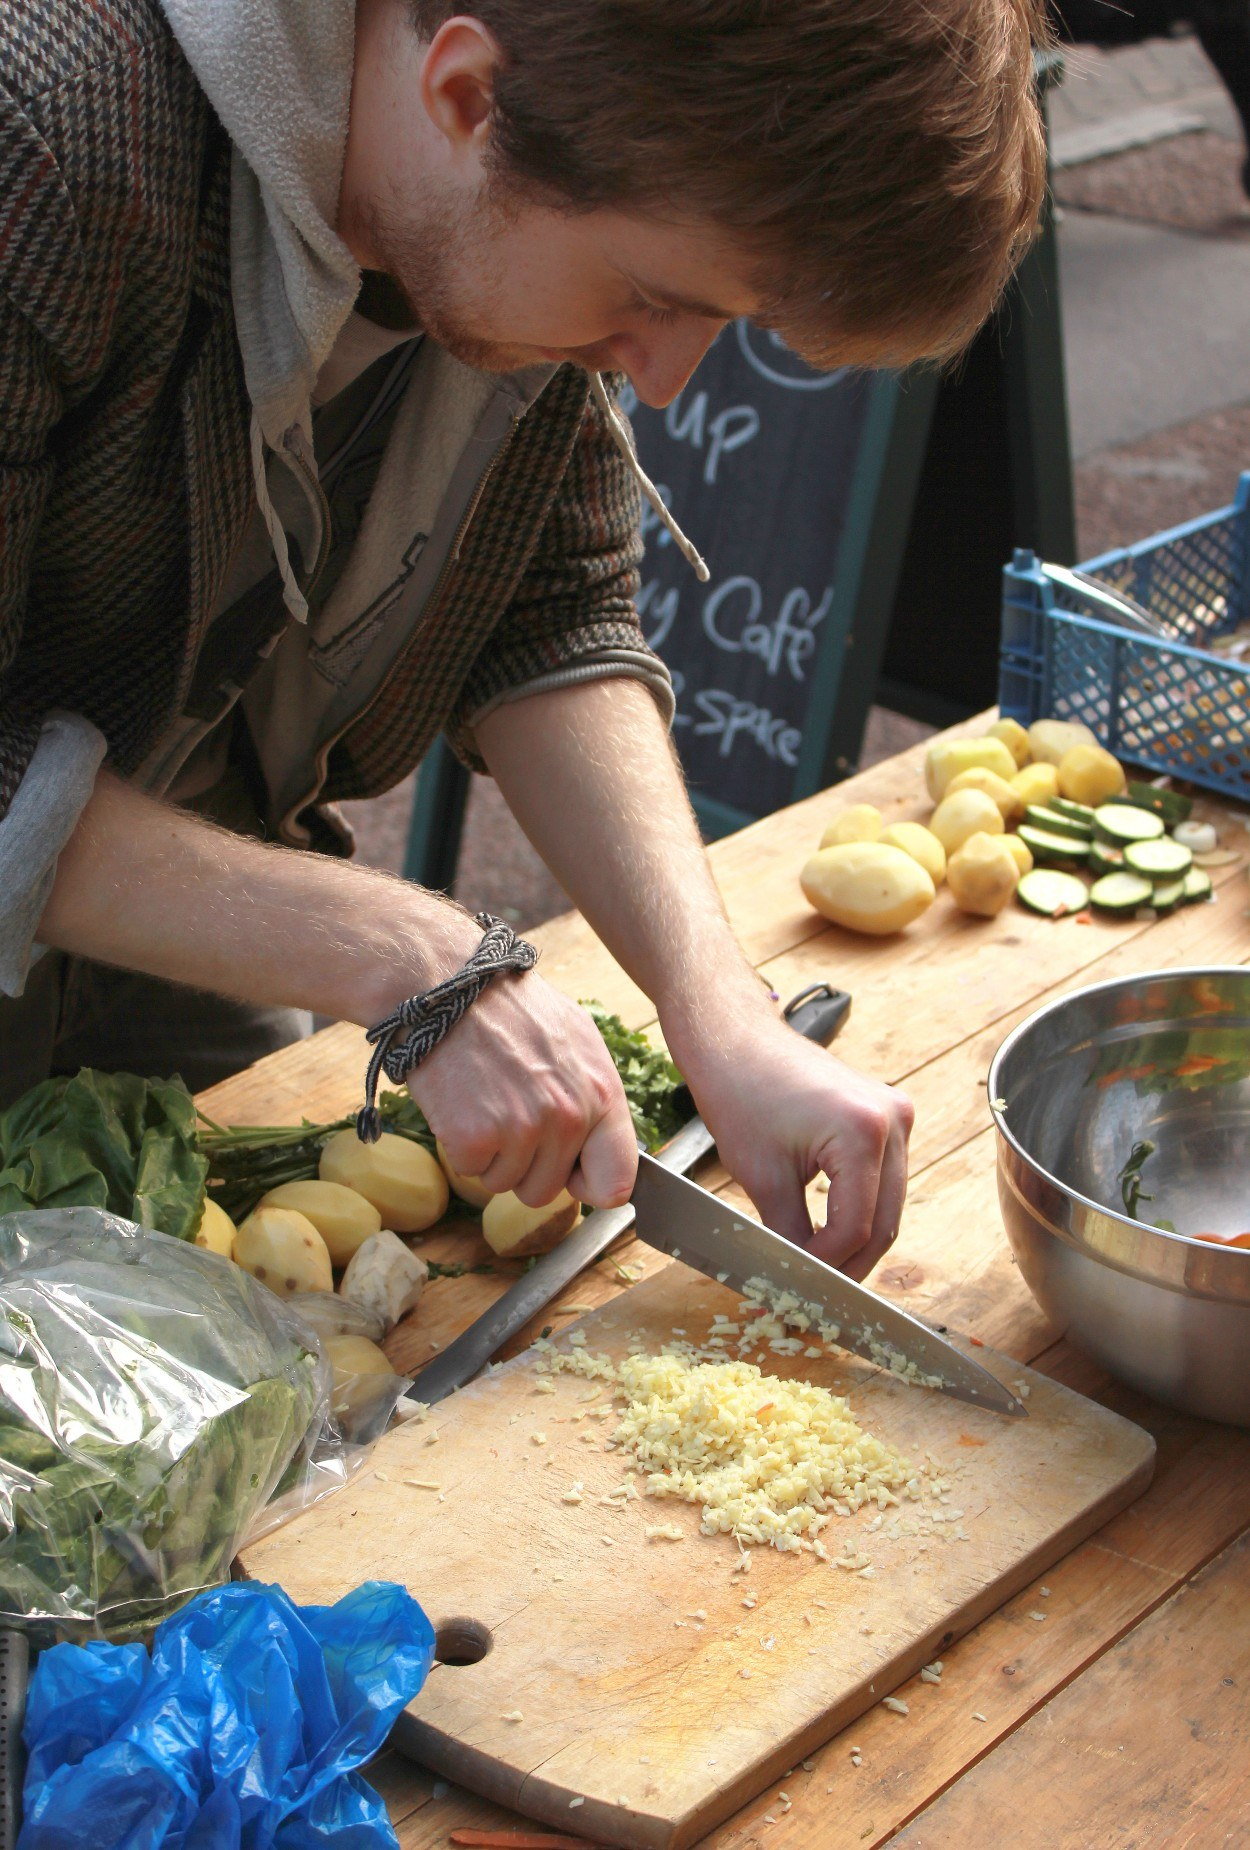 A man chopping vegetables on a chopping board